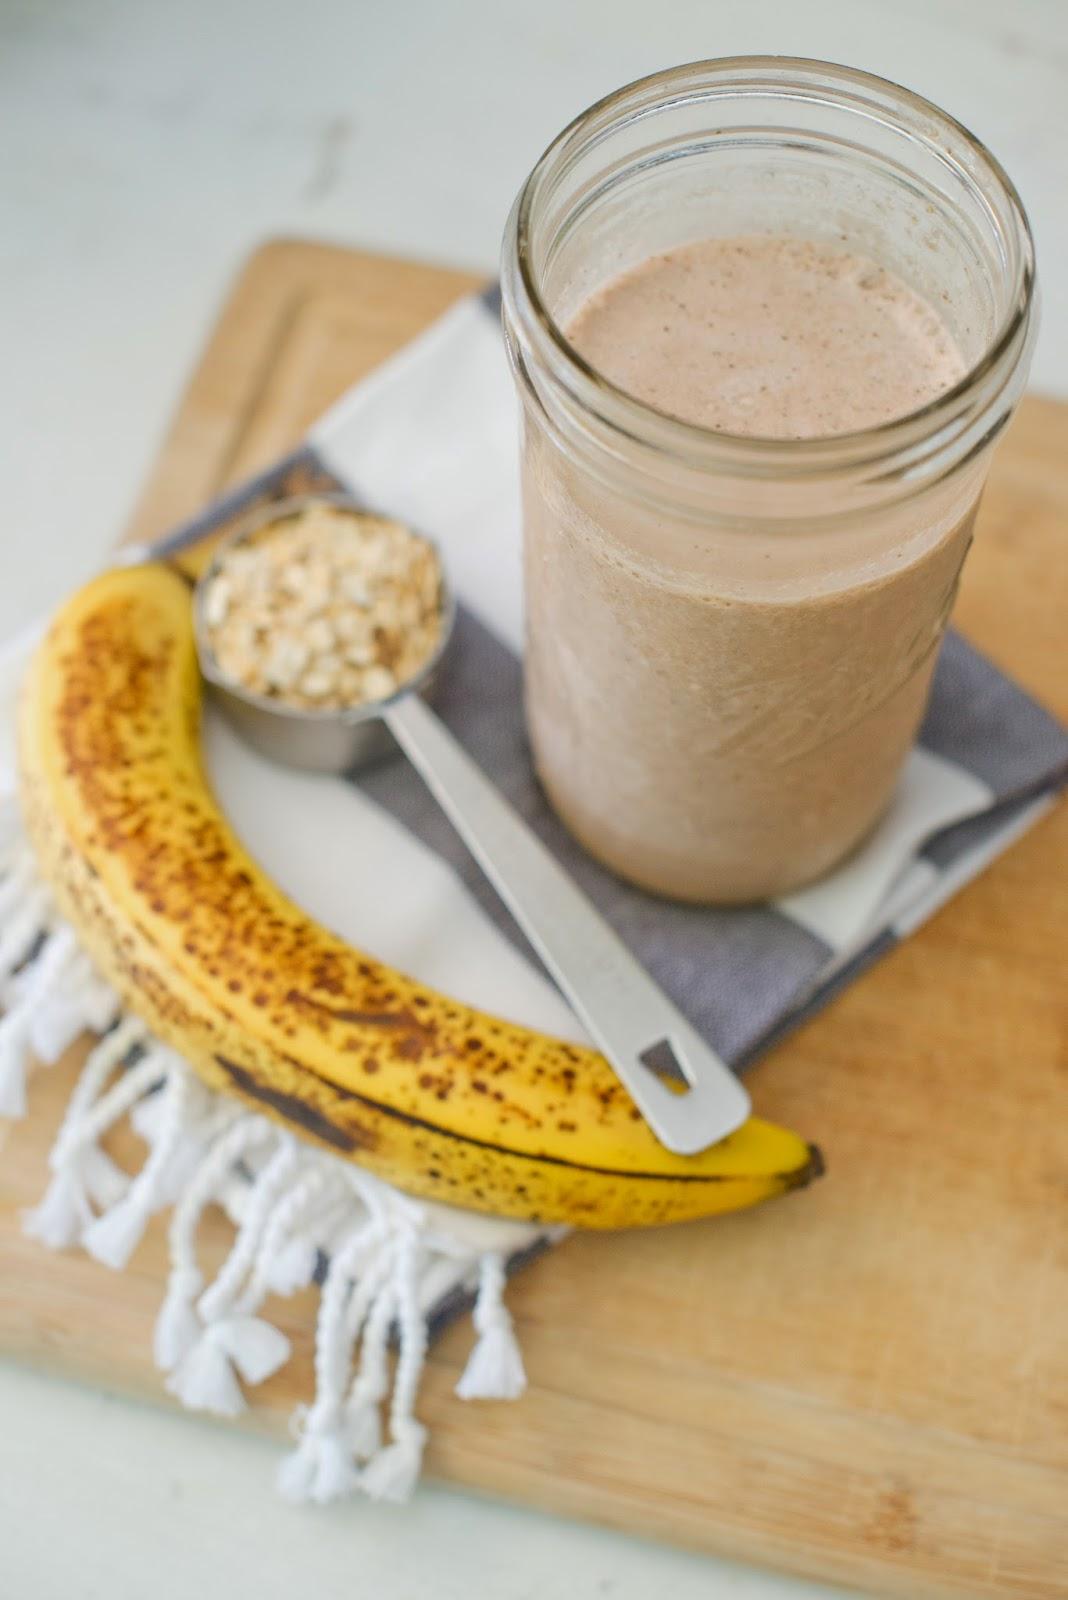 choco banaan eiwitshake recept